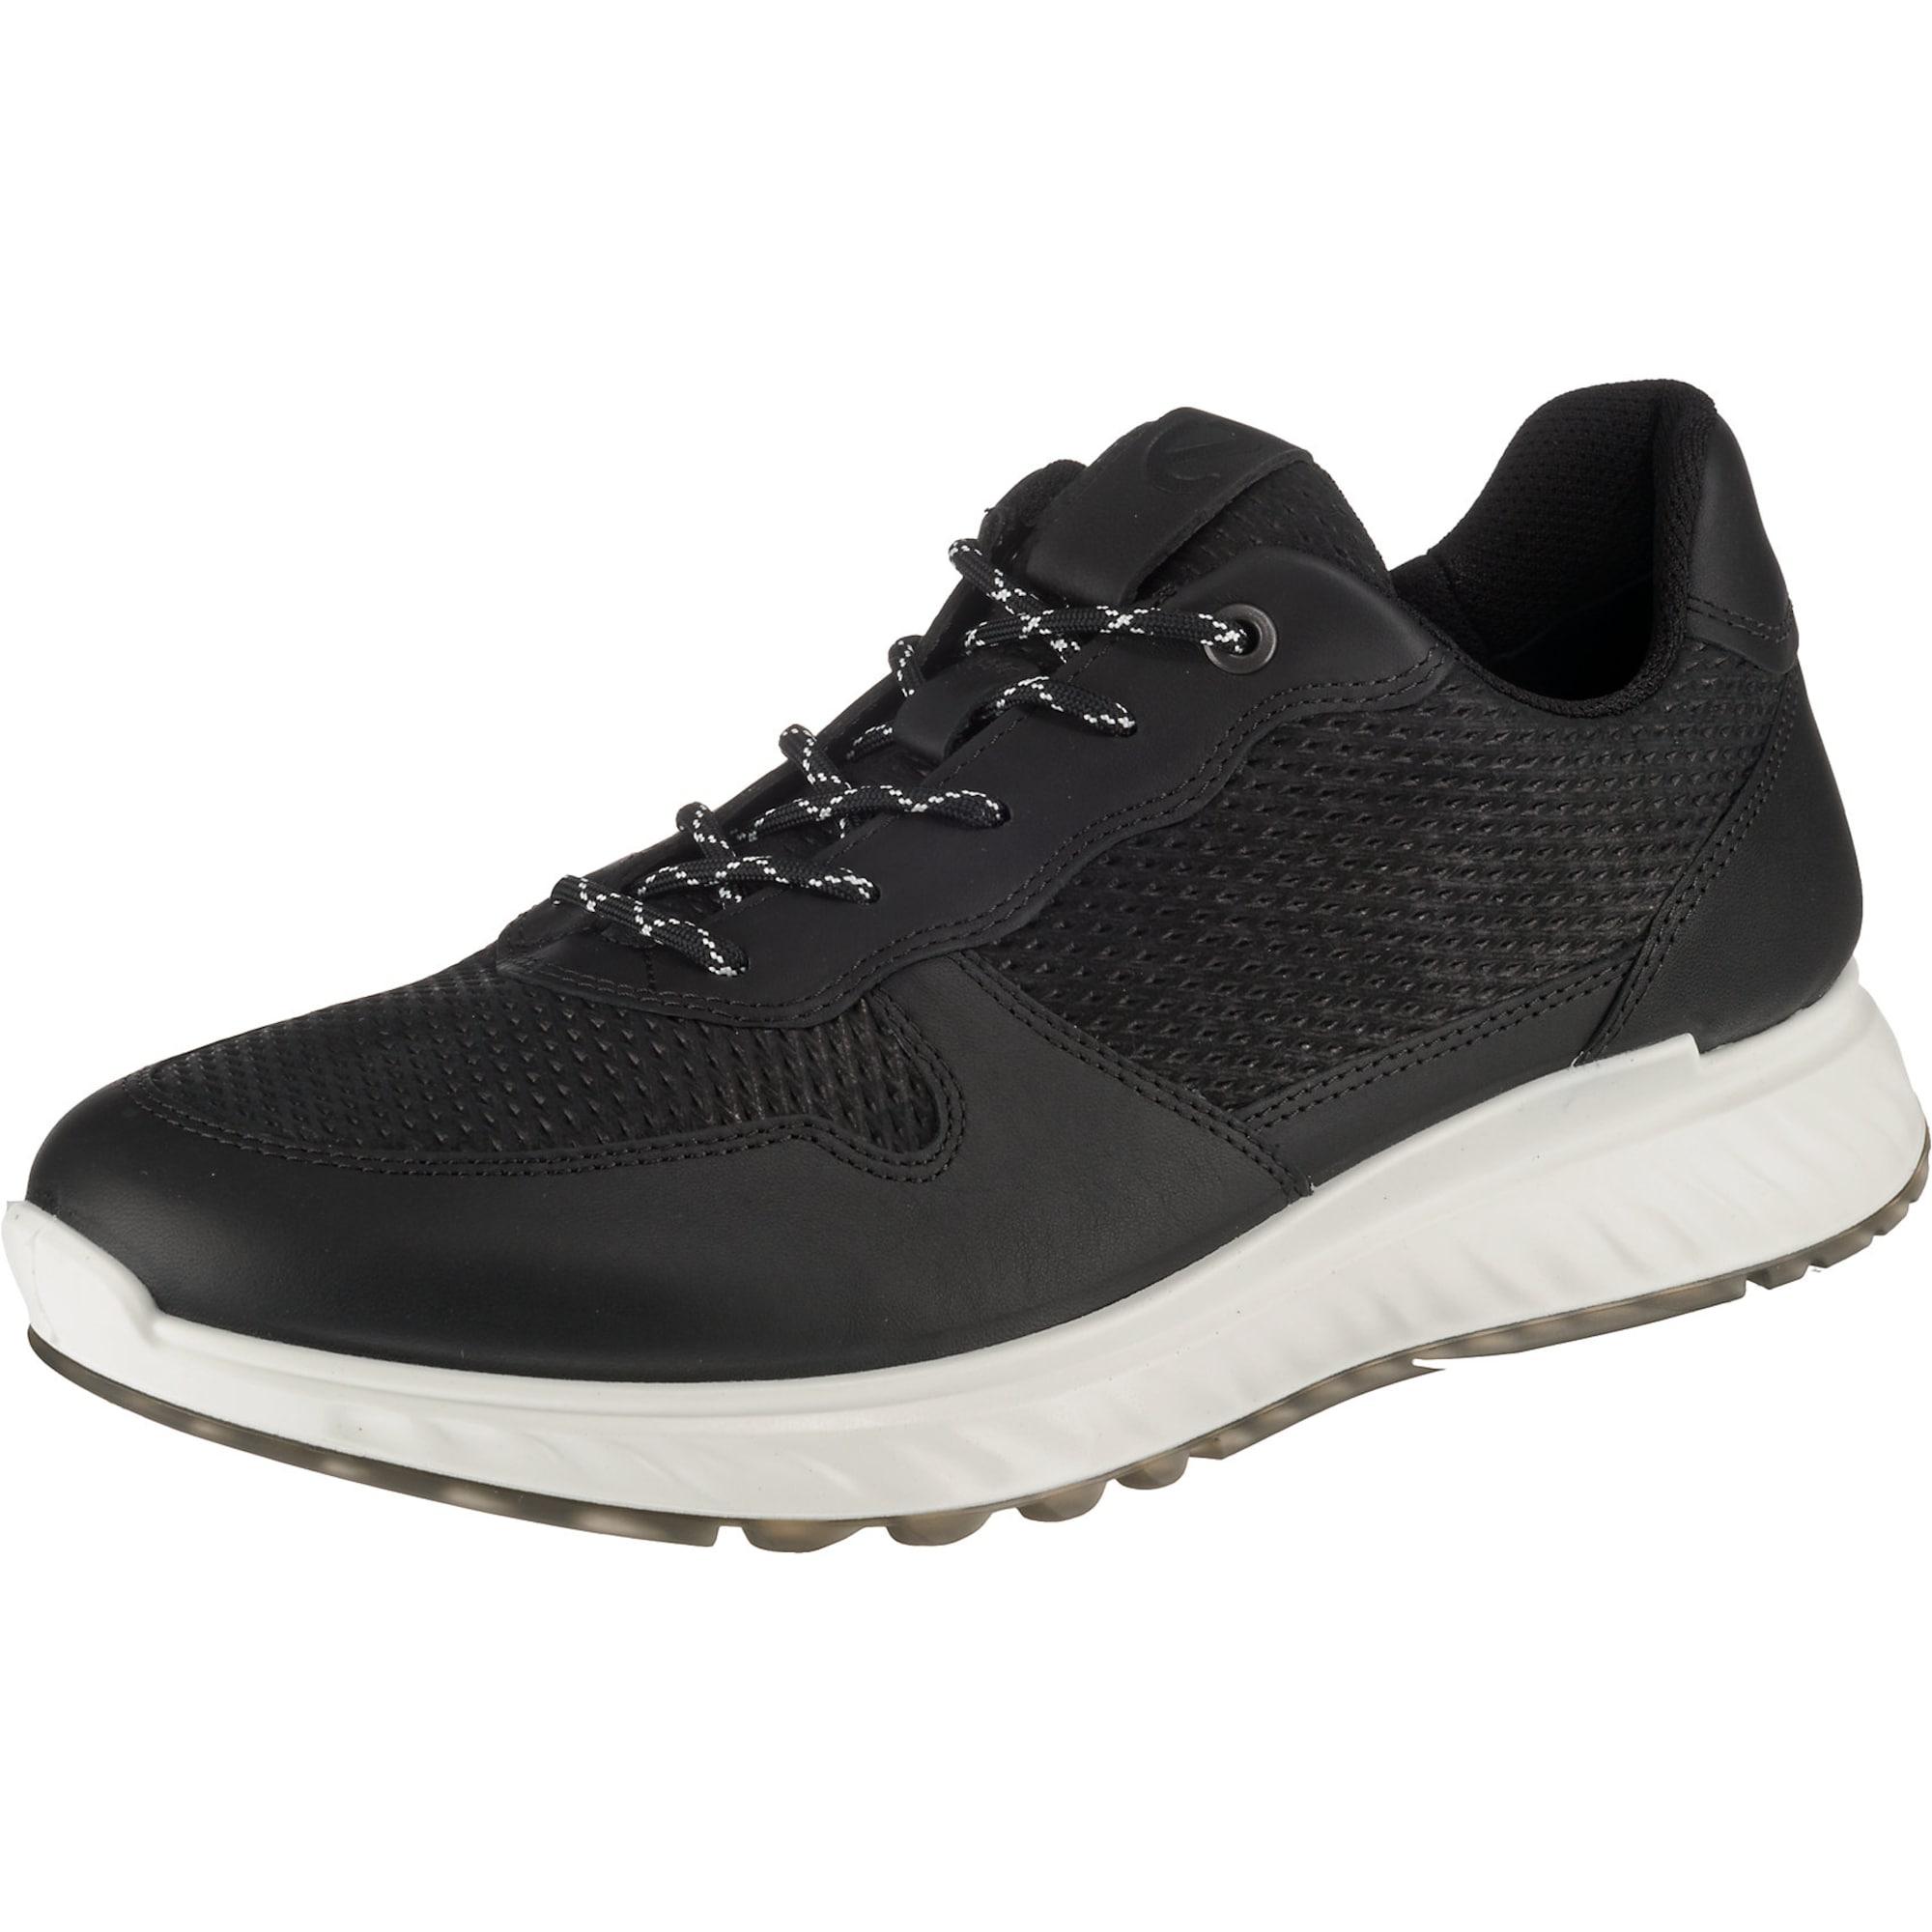 Schnürschuhe 'St. 1 Hybrid' | Schuhe > Schnürschuhe | ECCO